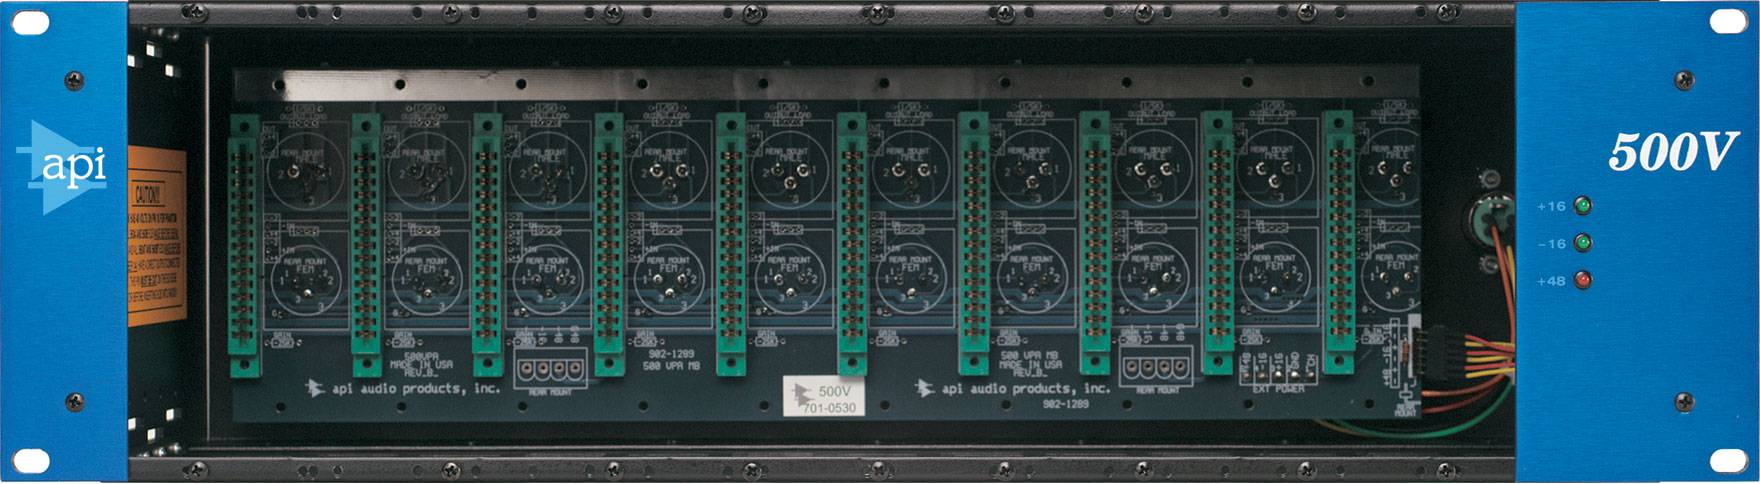 Lunchbox API 500 VPR  4U 机架